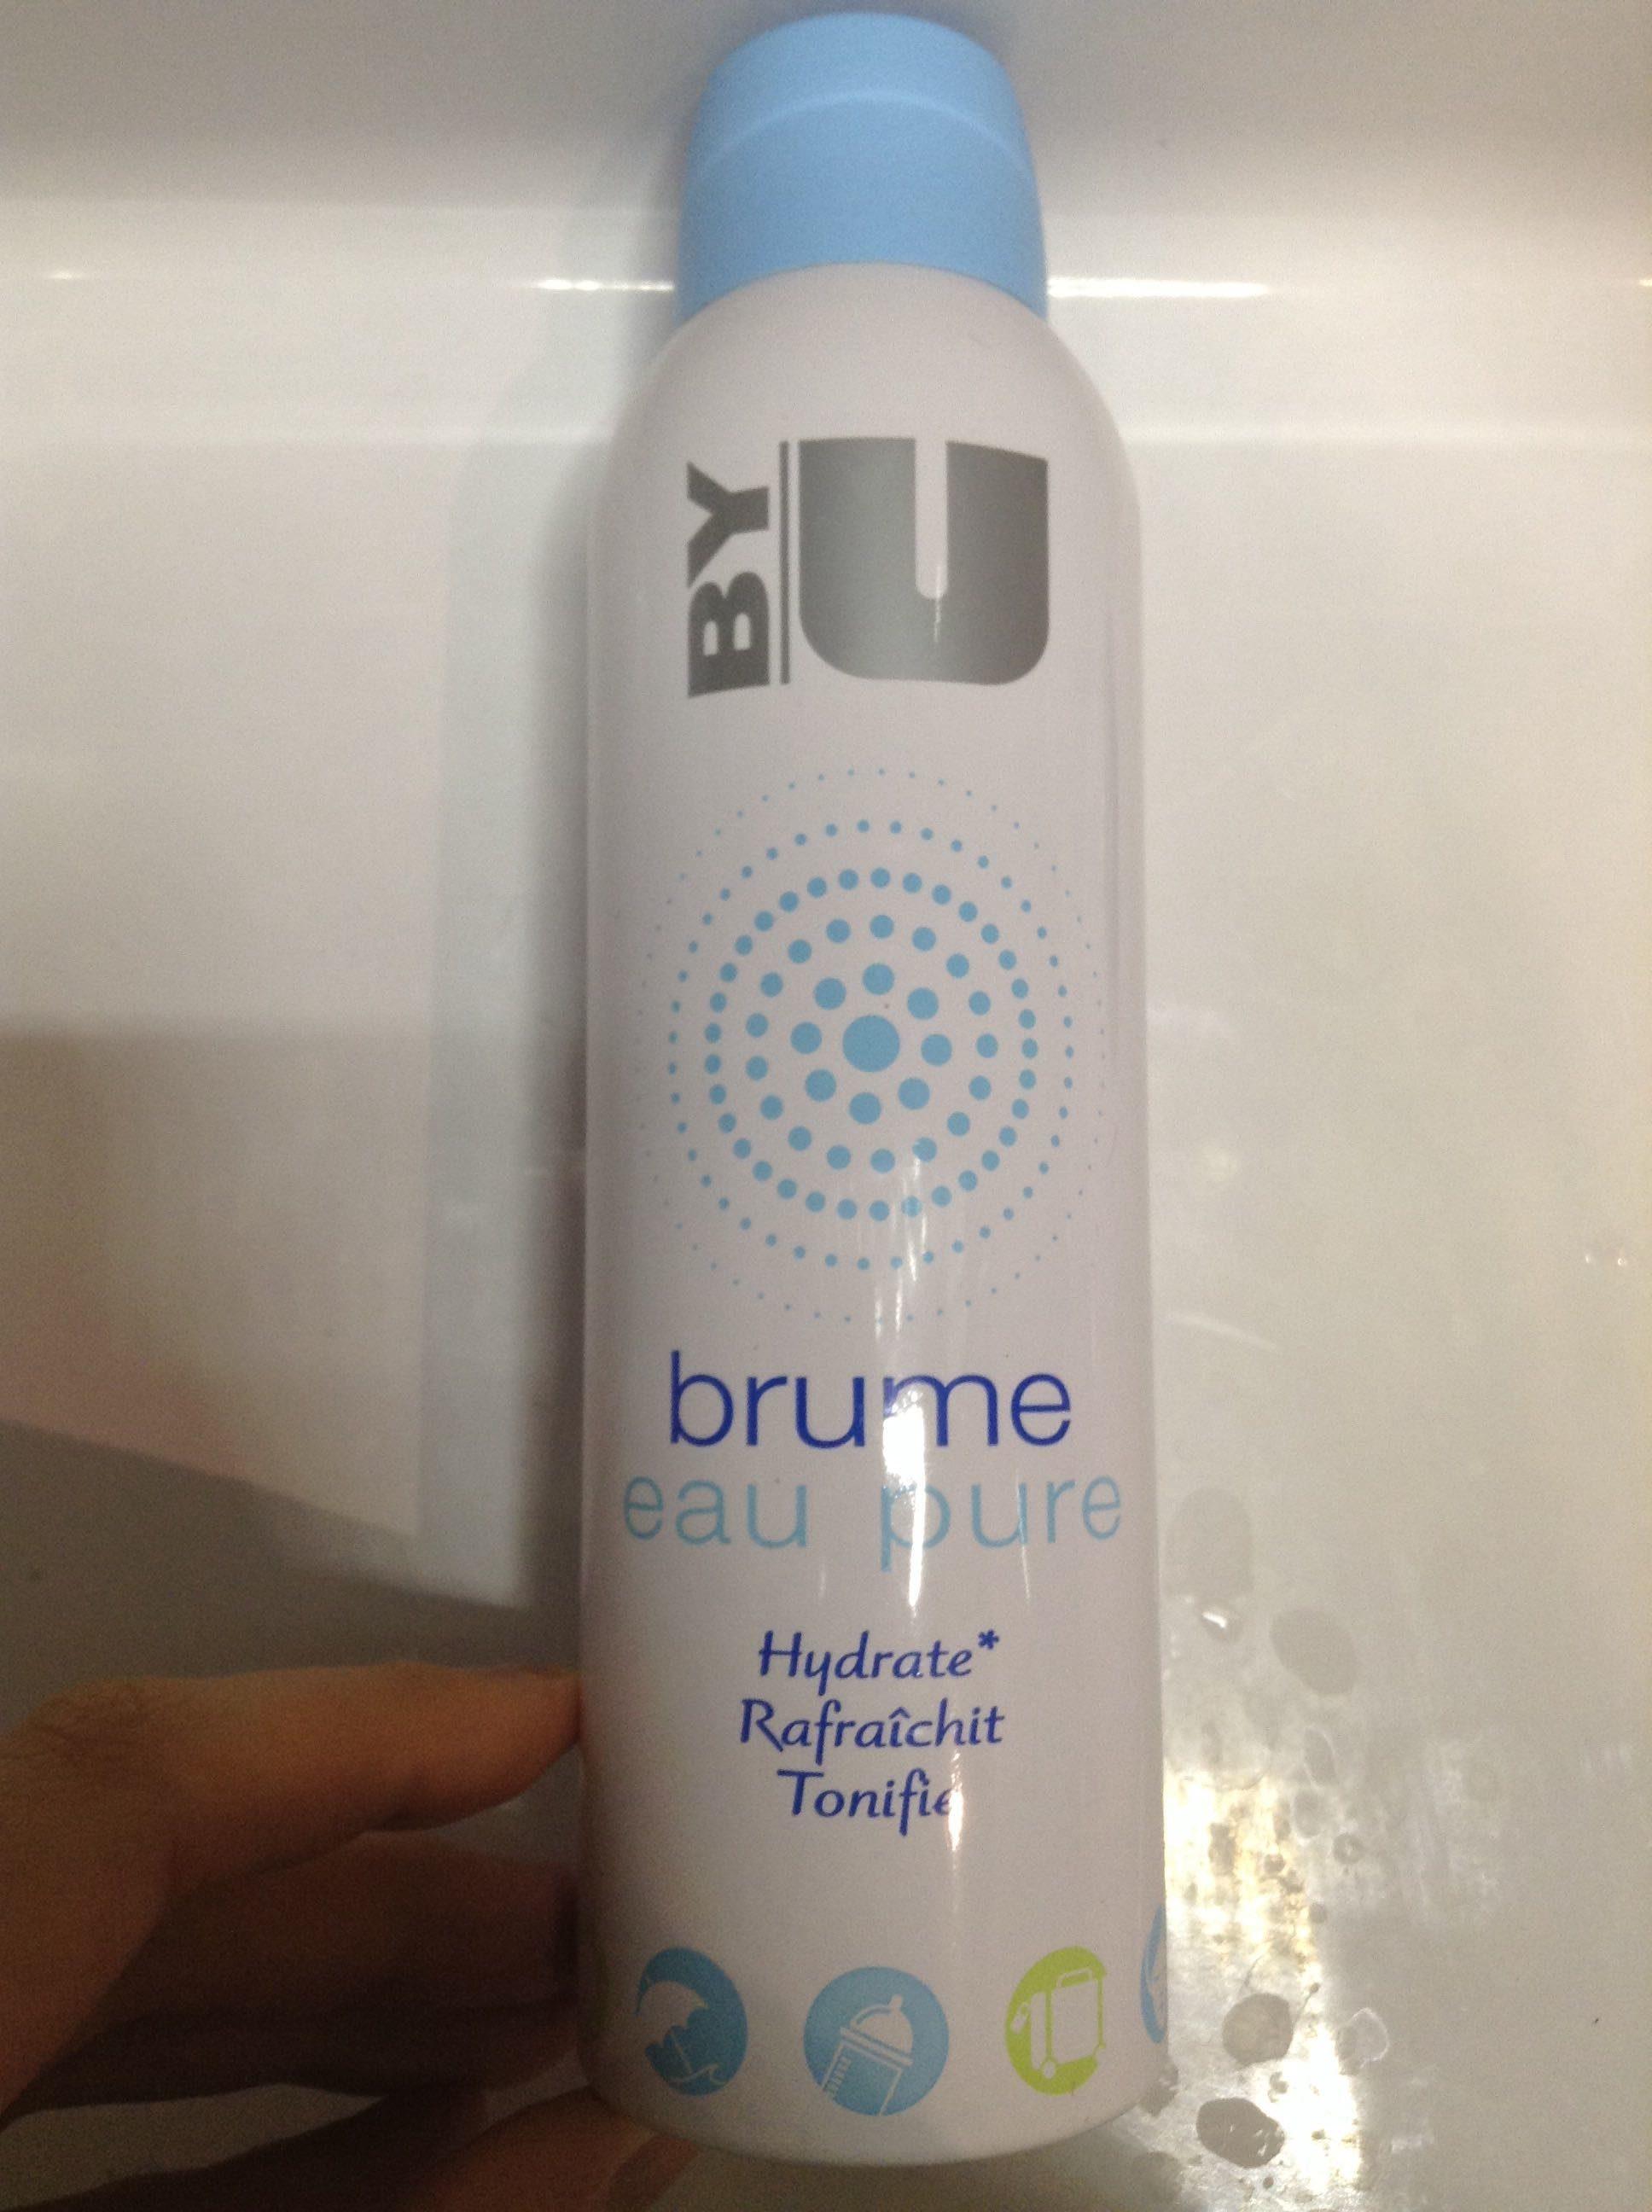 Brume eau pure - Product